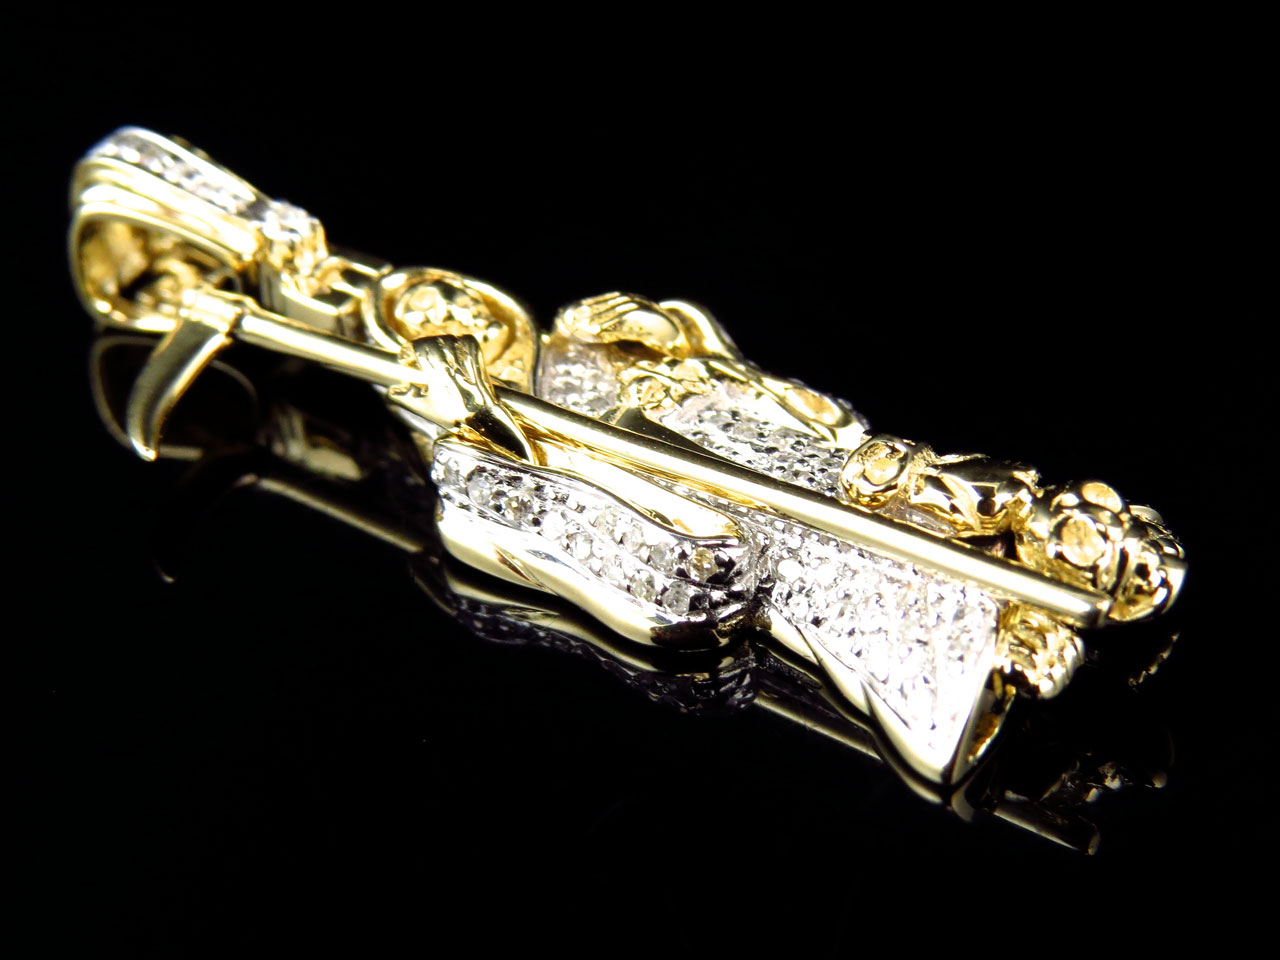 10k yellow gold genuine diamond grim reaper pendant charm 050ct 10k yellow gold genuine diamond grim reaper pendant charm 050ct 150 walmart aloadofball Gallery